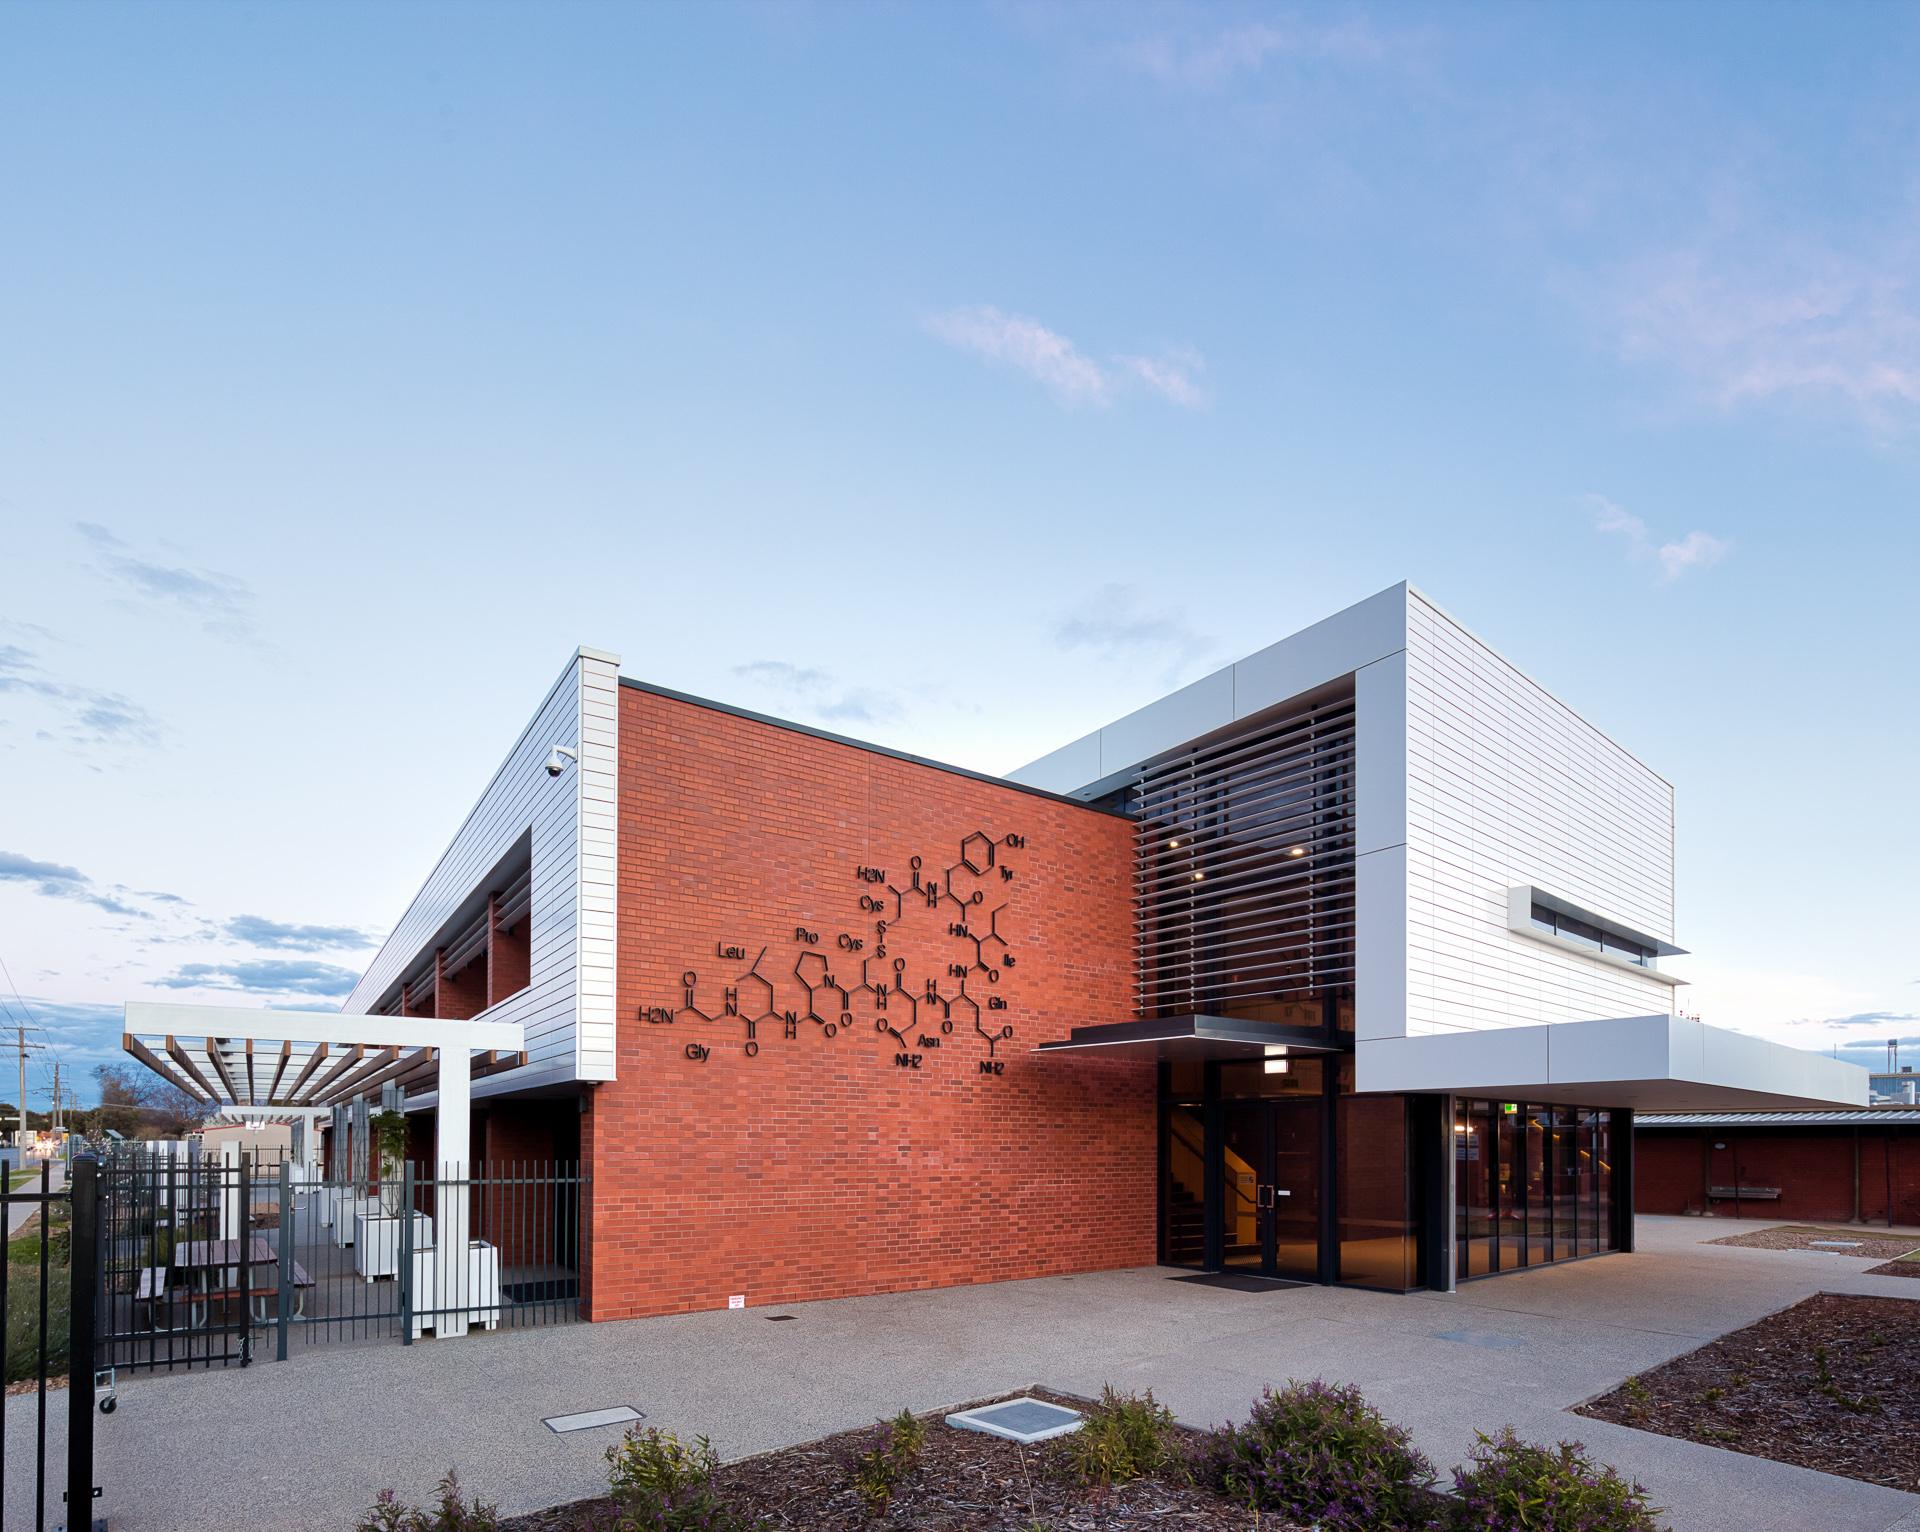 notre-dame-college-science-centre-shepparton-vic---terracade-tn-glazed---whitehaven-9_44456903672_o.jpg